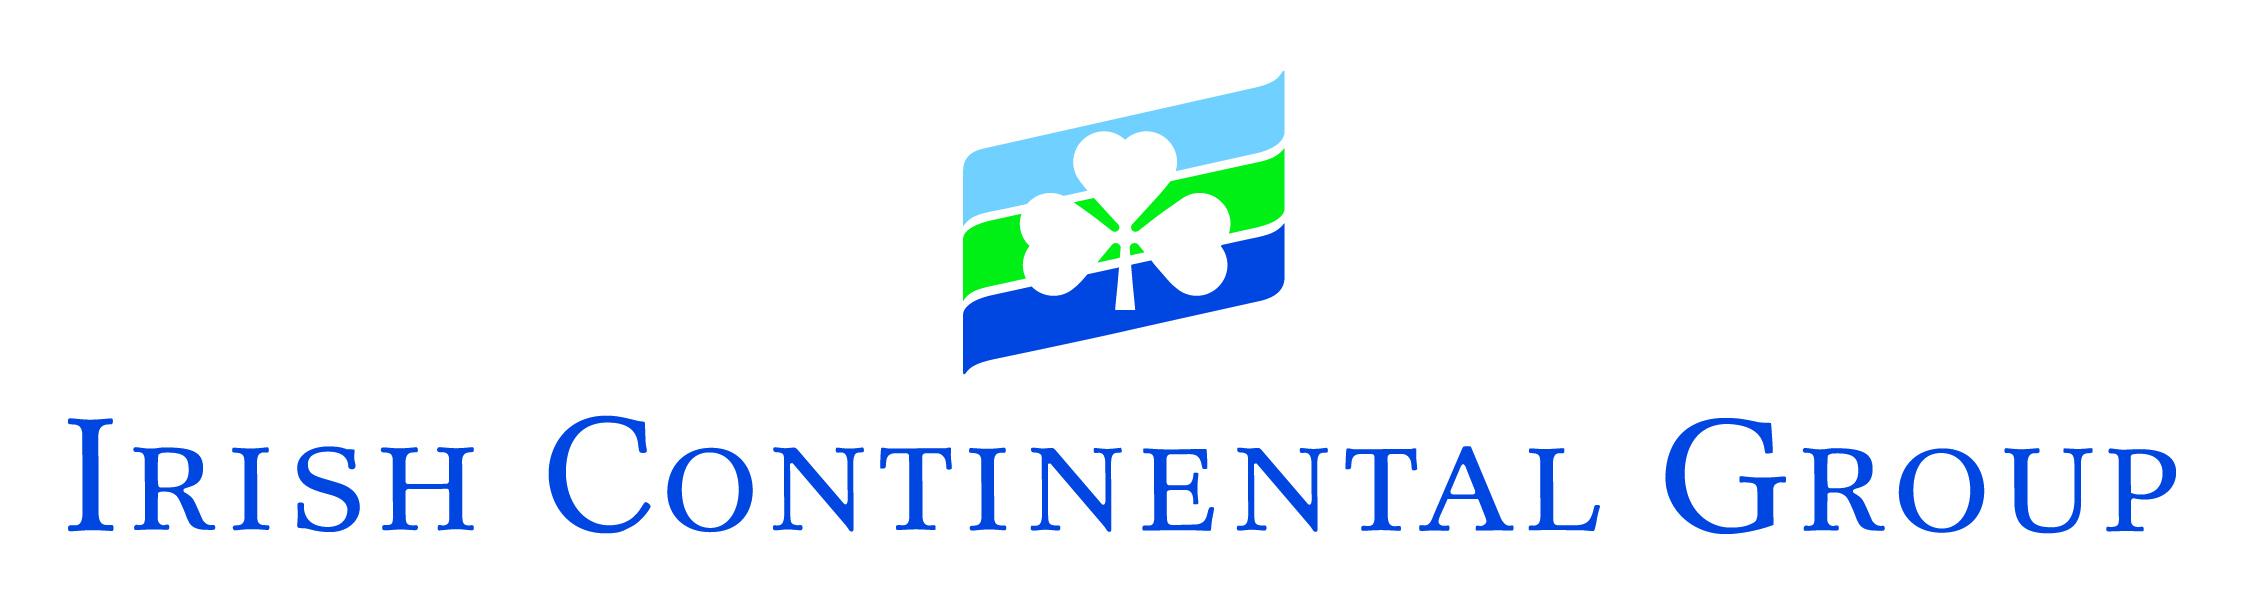 Irish Continental Group